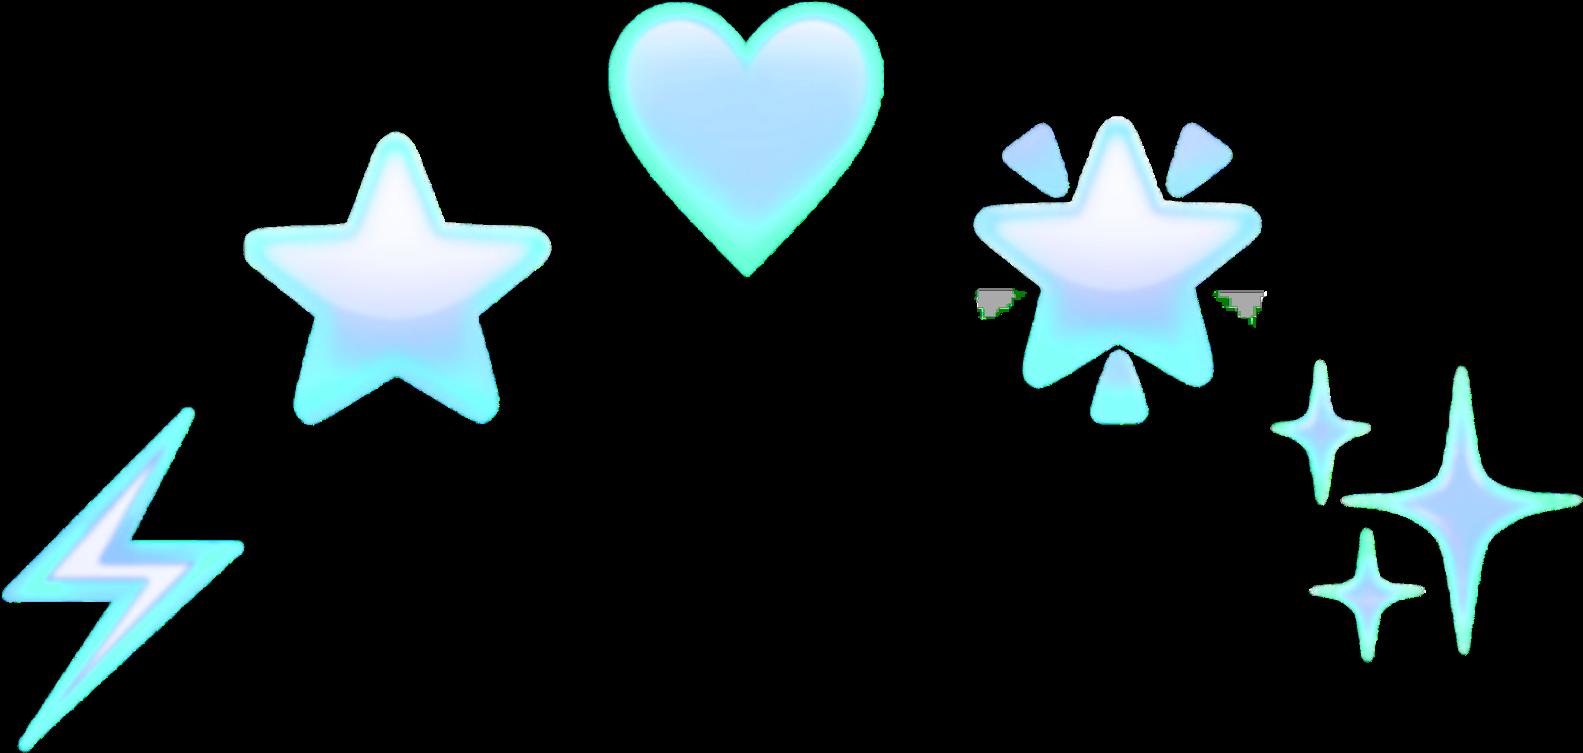 Emoji Heart Star Blue Design Decoration Thunder Head - Heart Clipart (2289x2289), Png Download